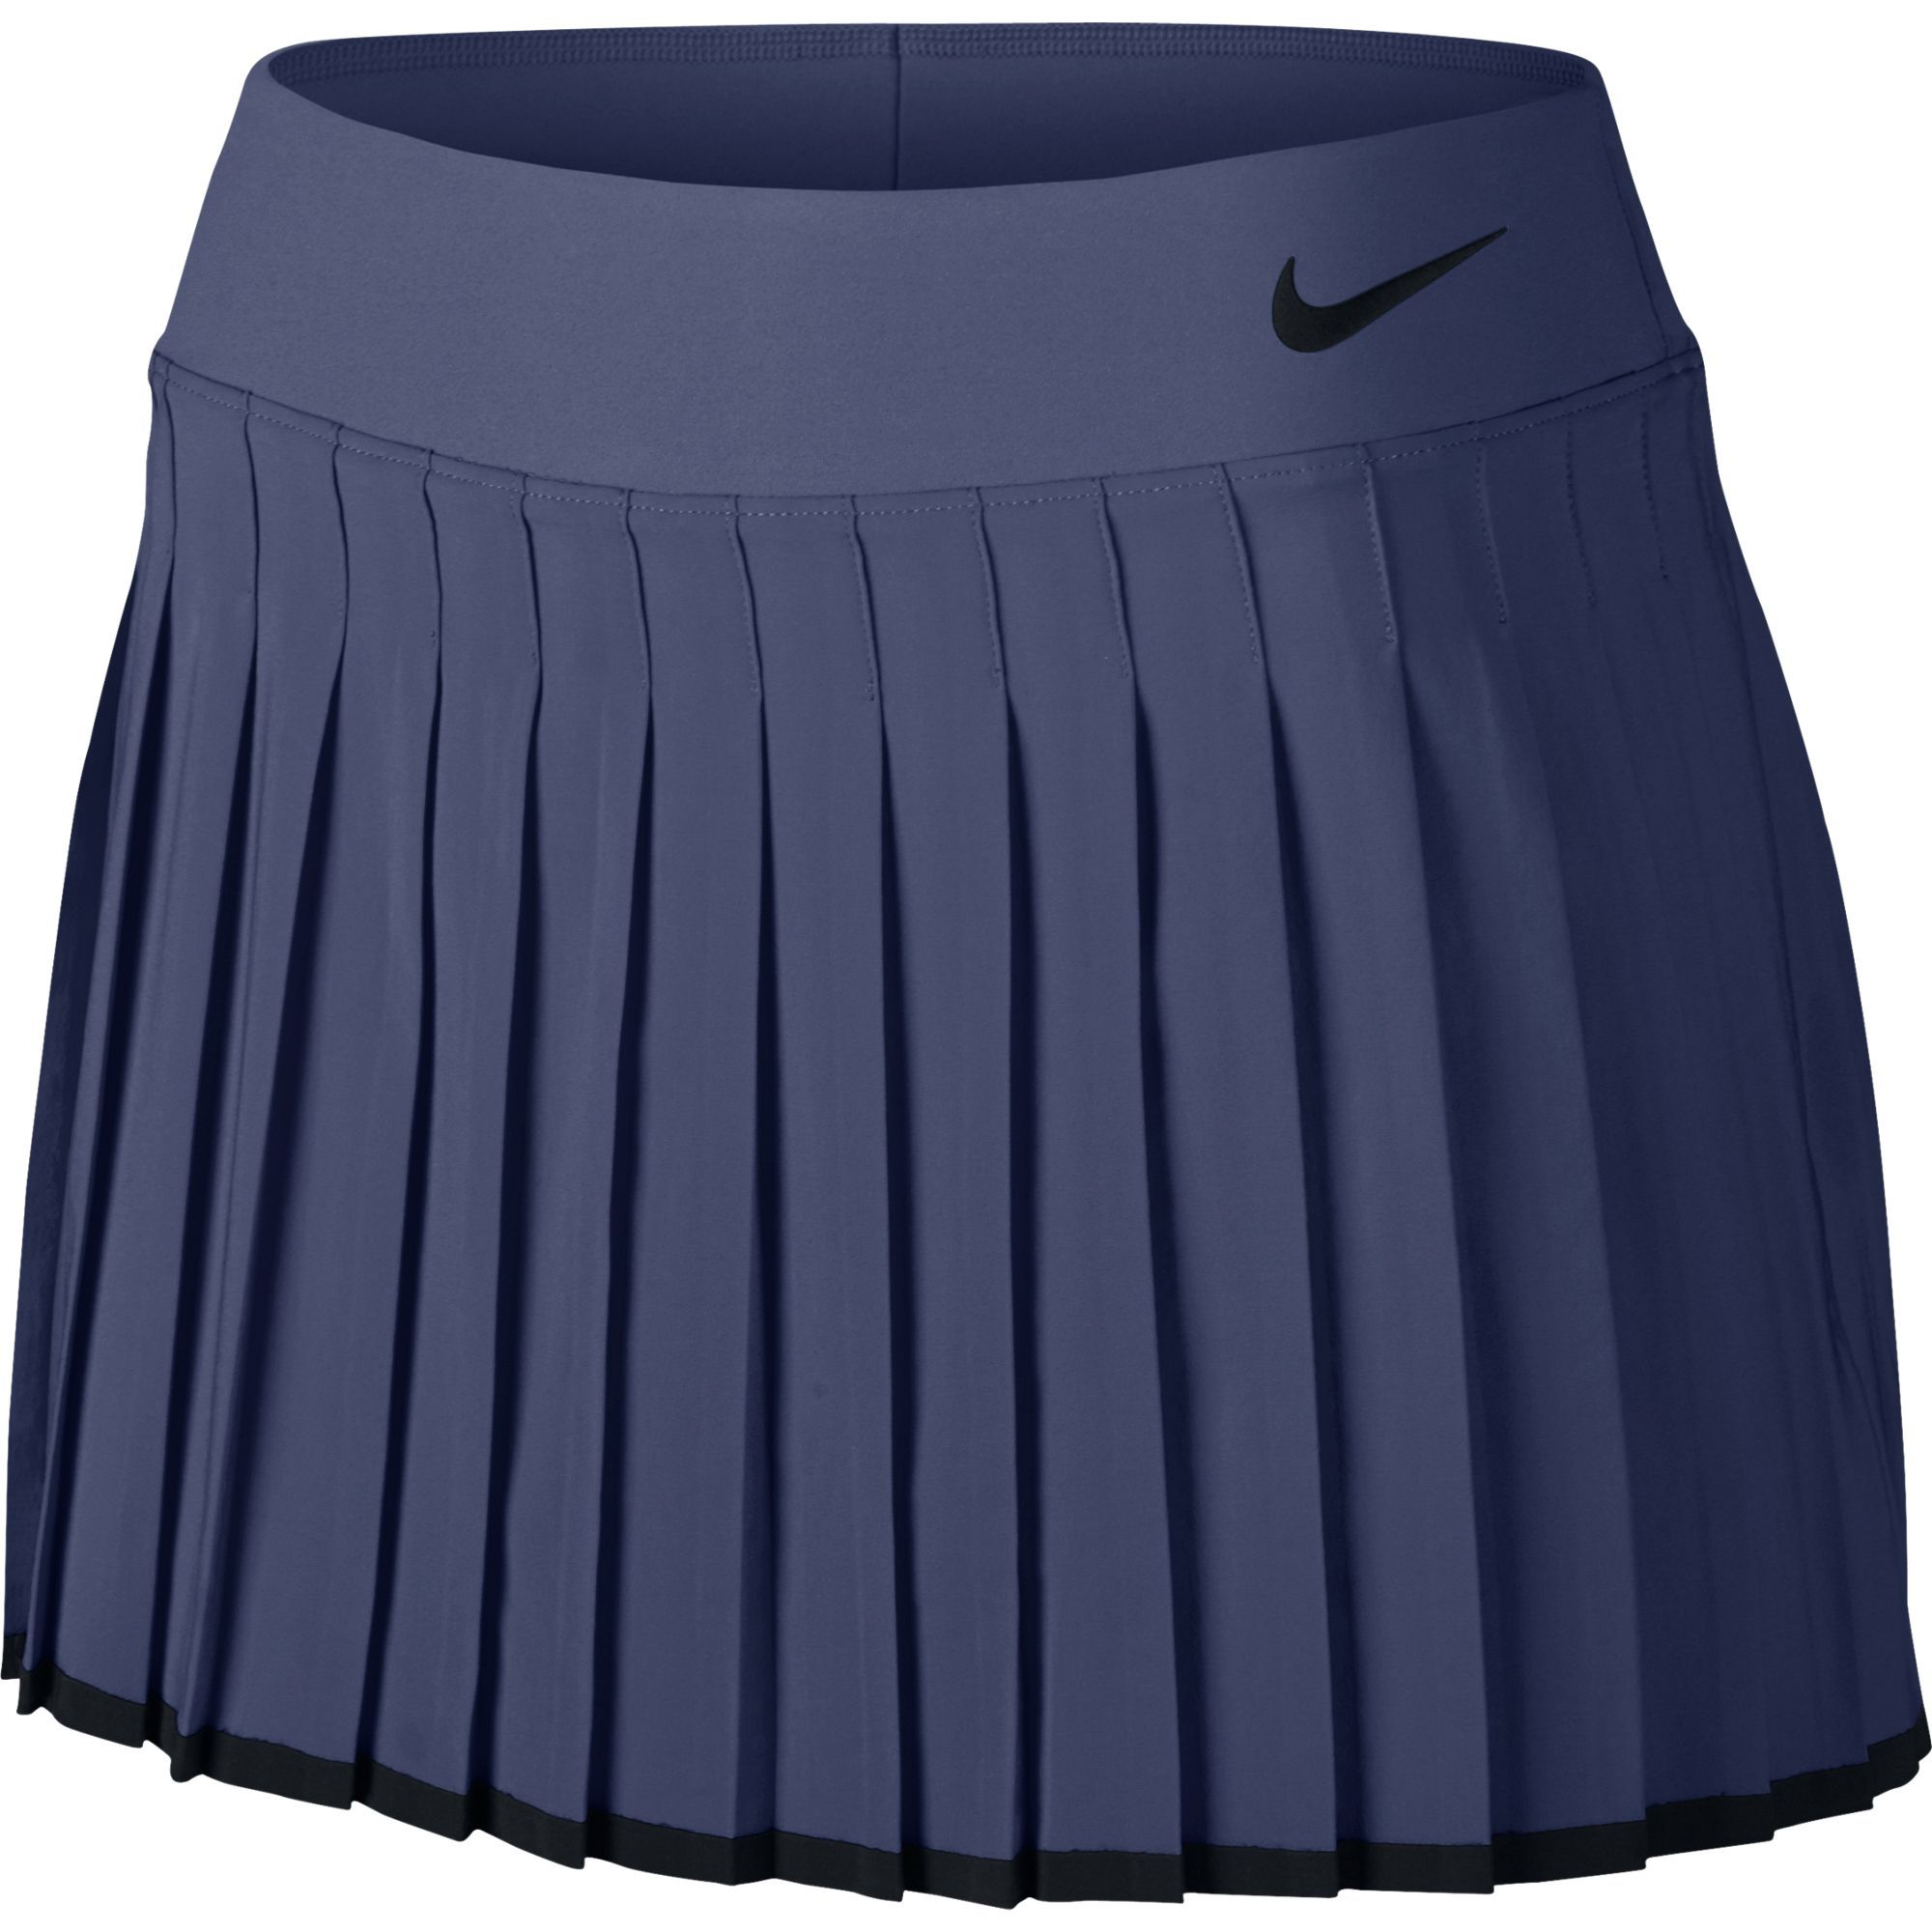 Nike Women S Court Victory Tennis Skirt Blue Tennis Outfit Women Tennis Skirts Tennis Skirt